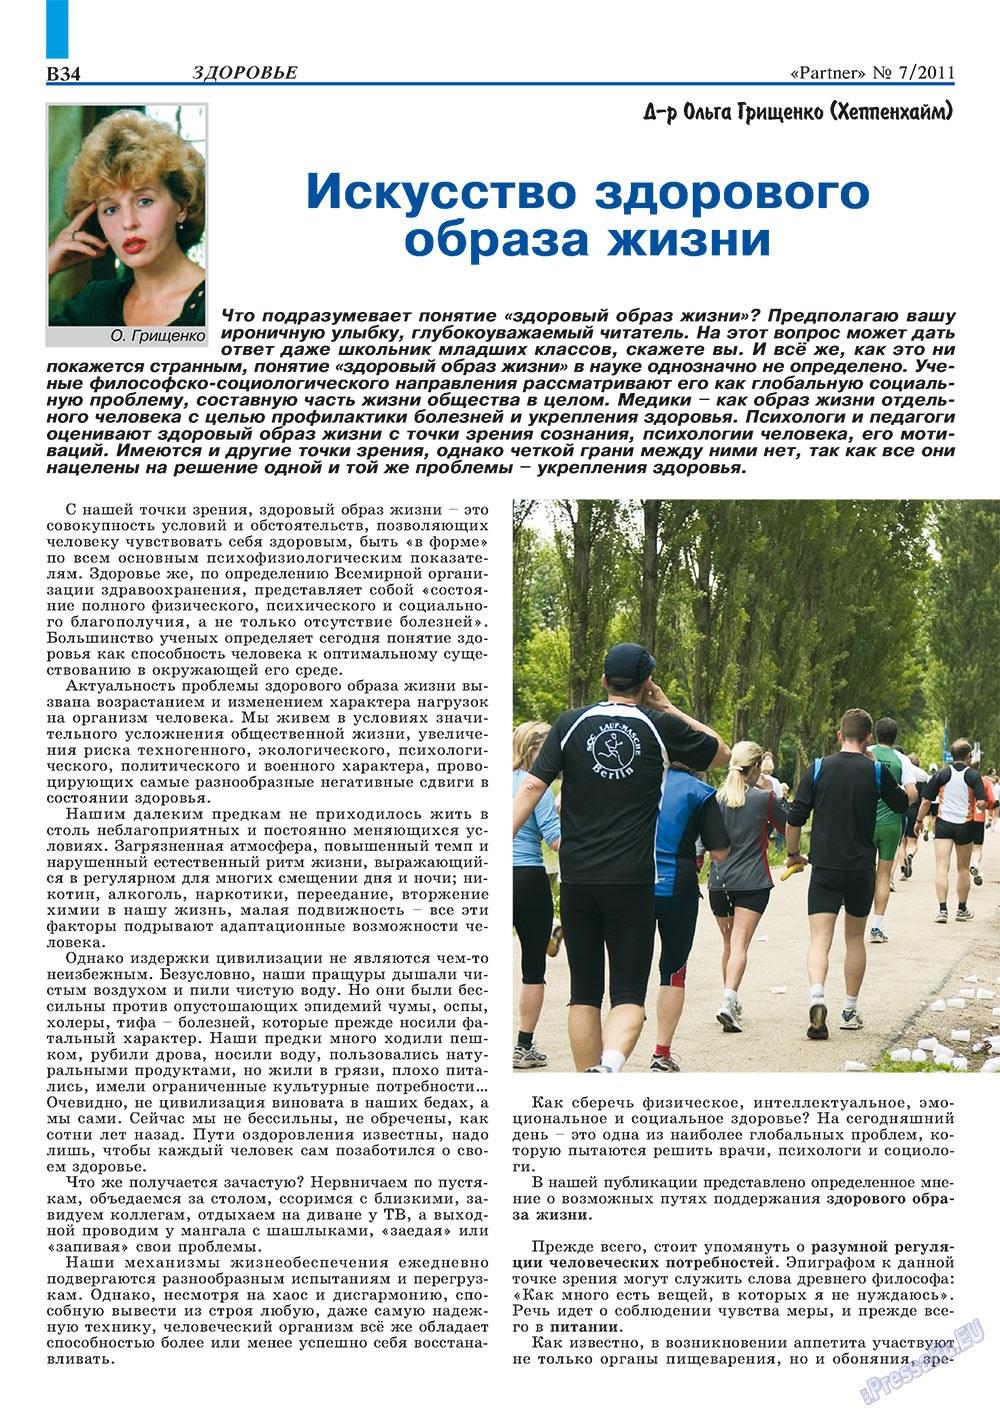 Партнер-север (журнал). 2011 год, номер 7, стр. 44